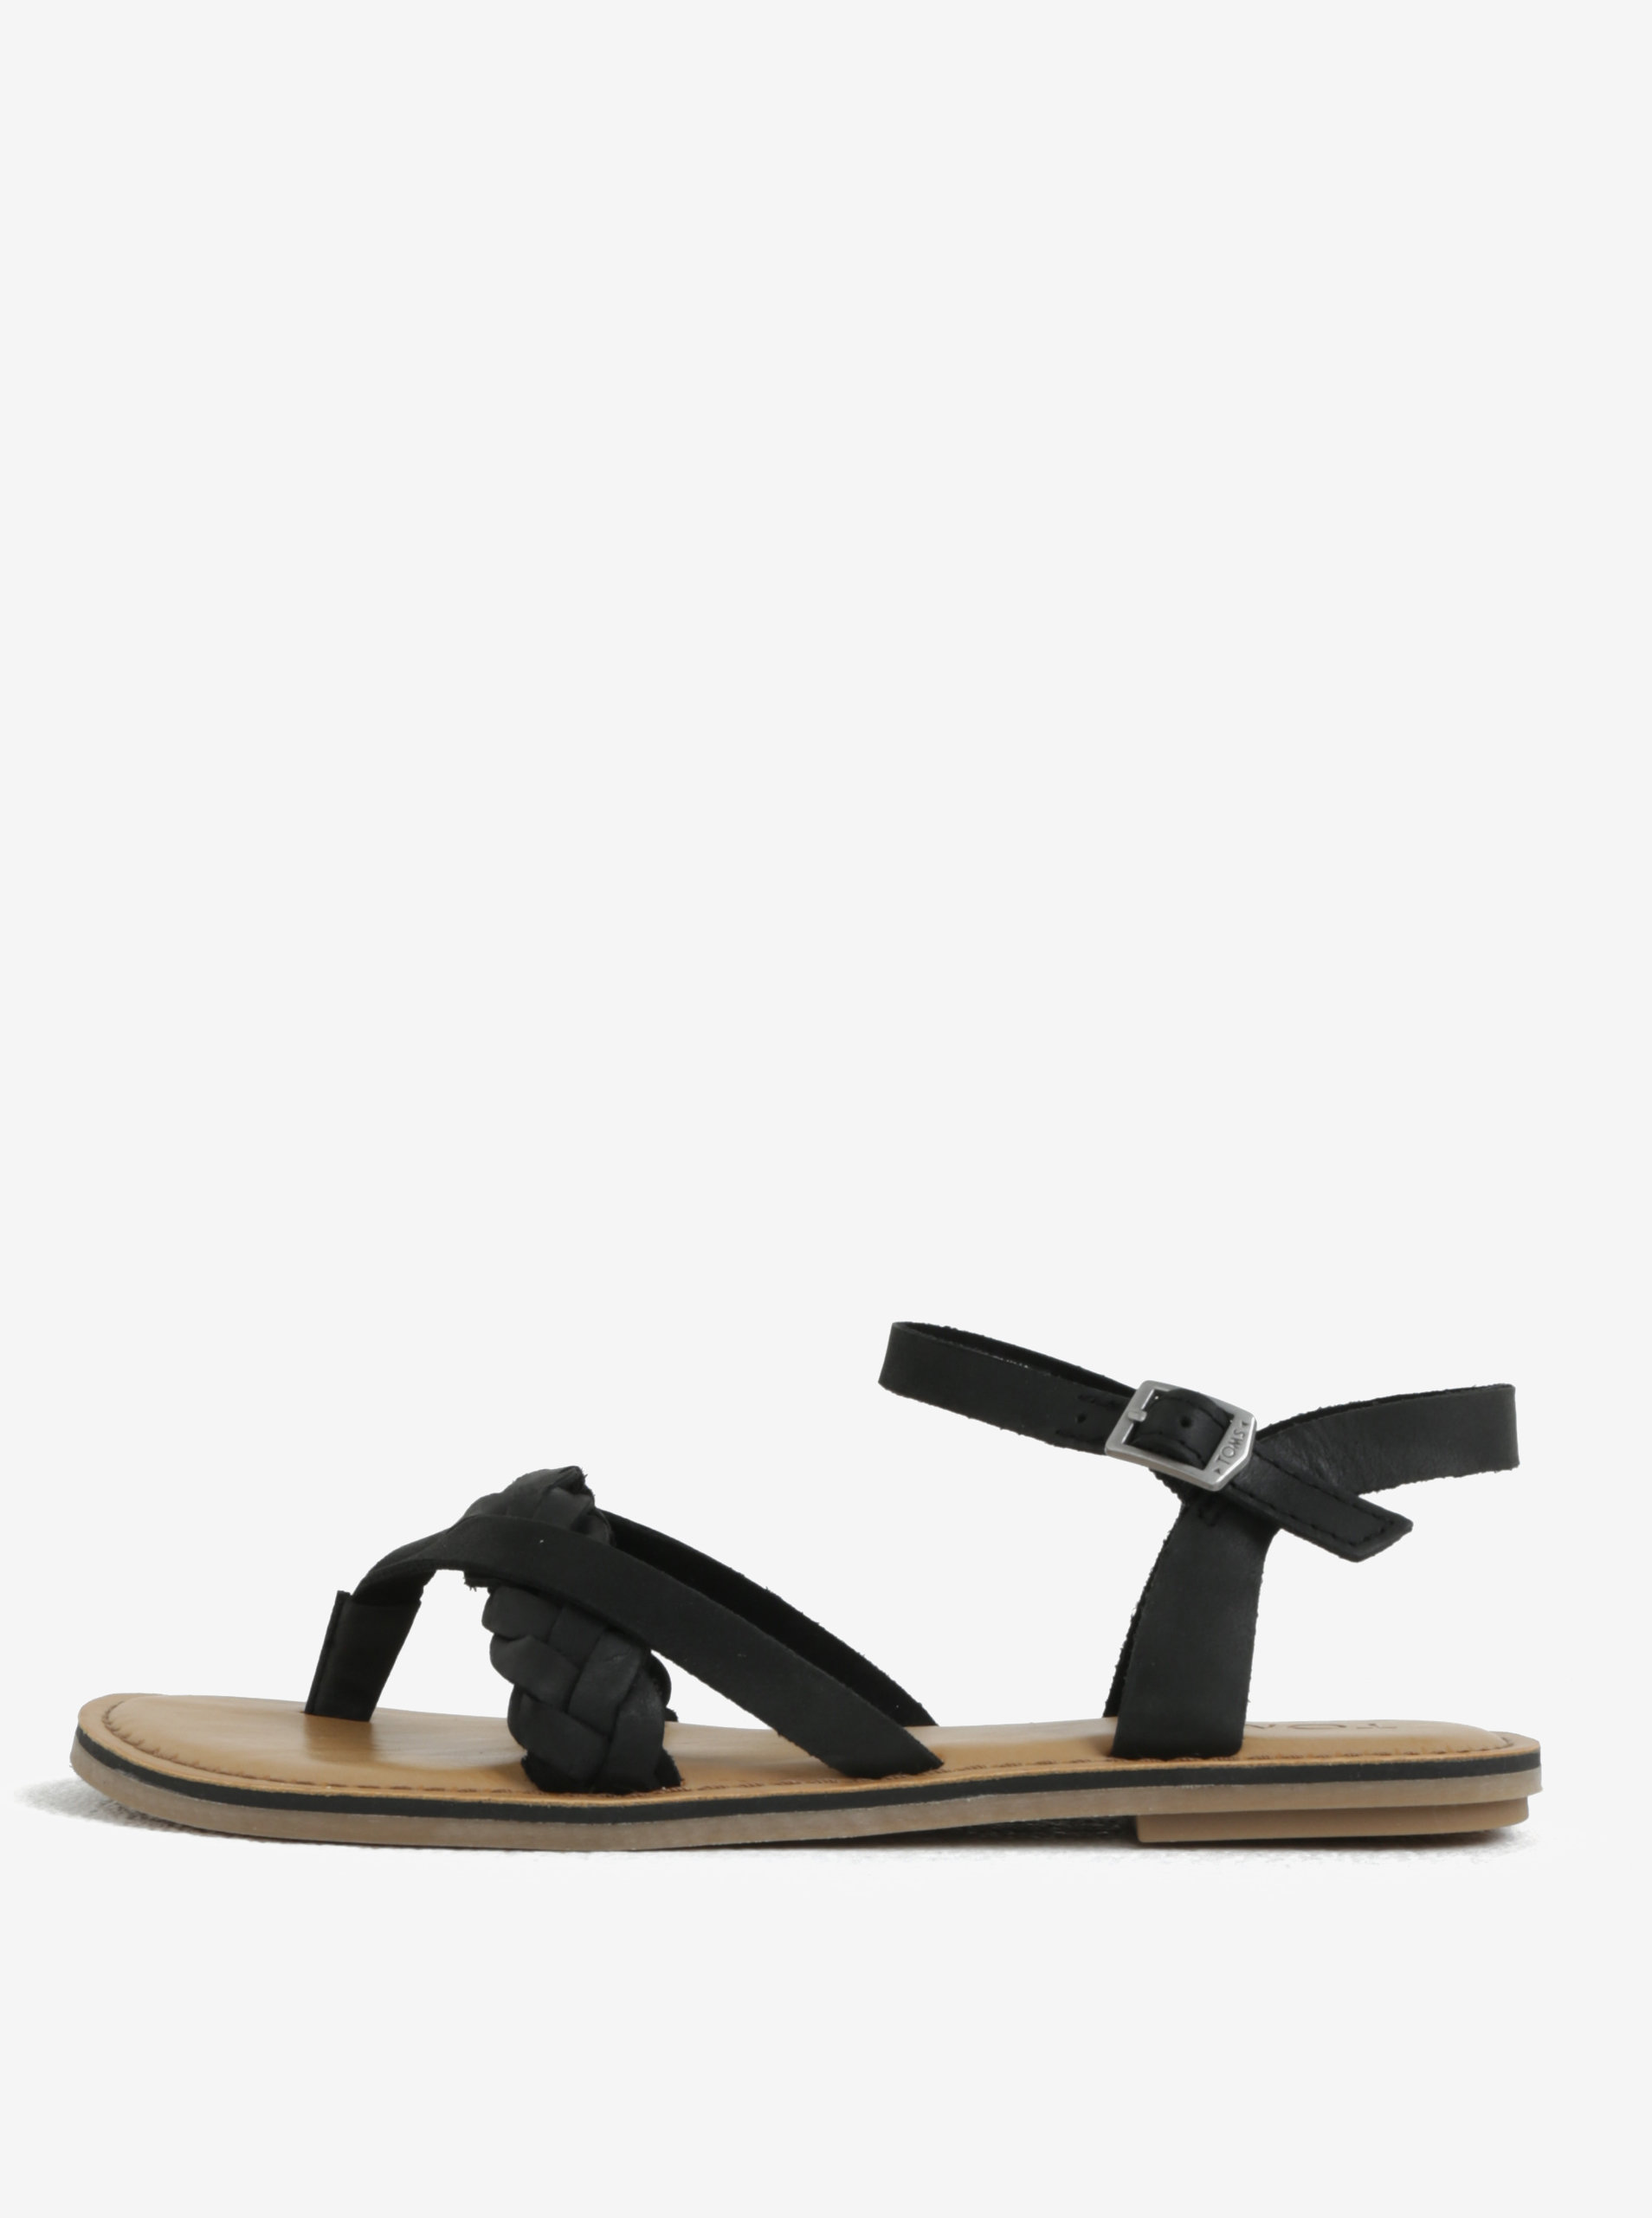 Černé dámské kožené sandály TOMS Lexie ... c1b0ed2327